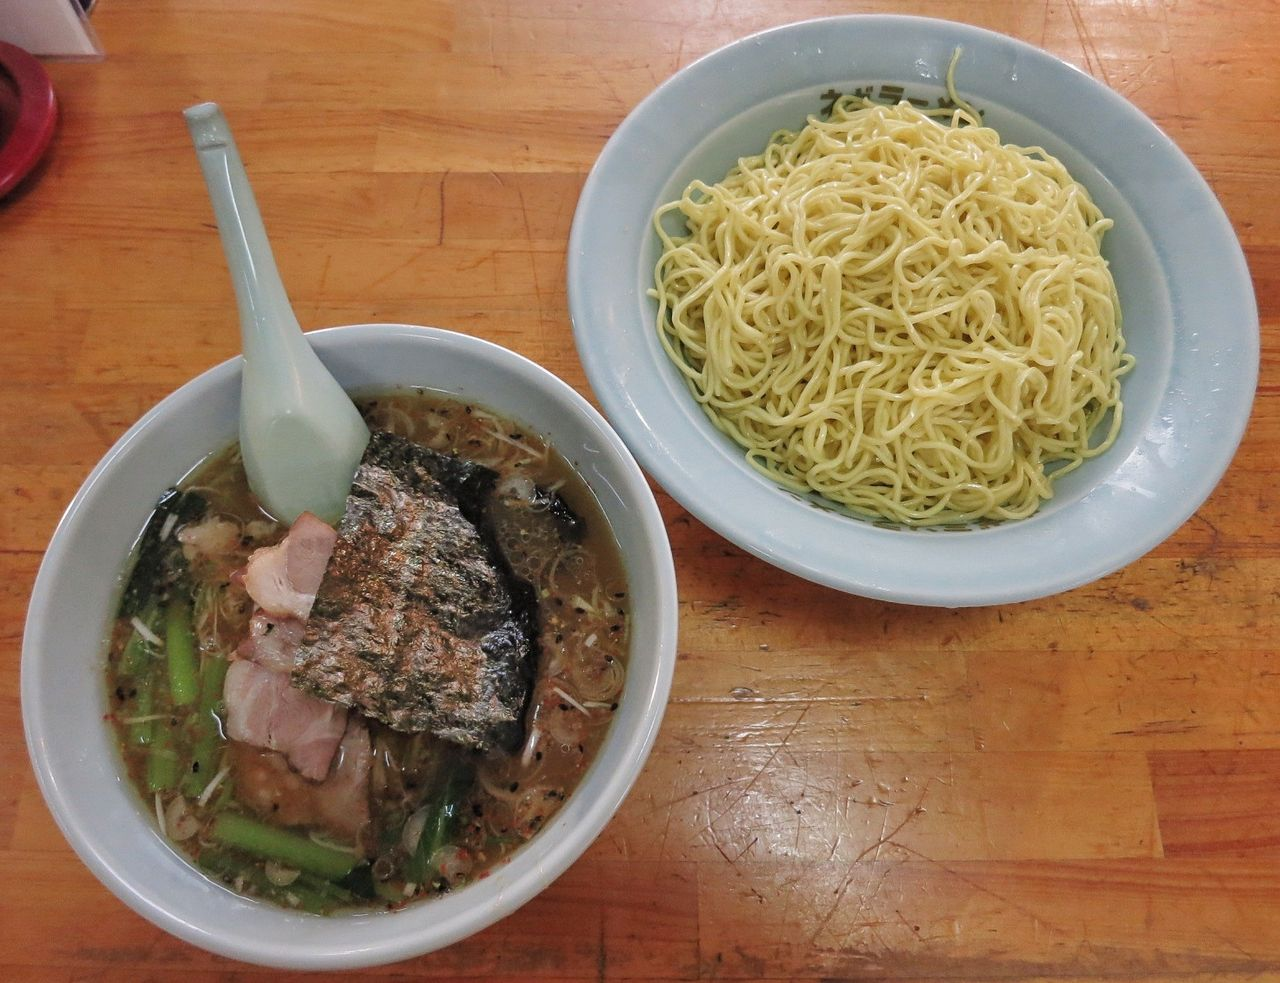 \u201cネギチャーシューつけ麺/酢控えめ(880円)+大盛り(200円)\u201d